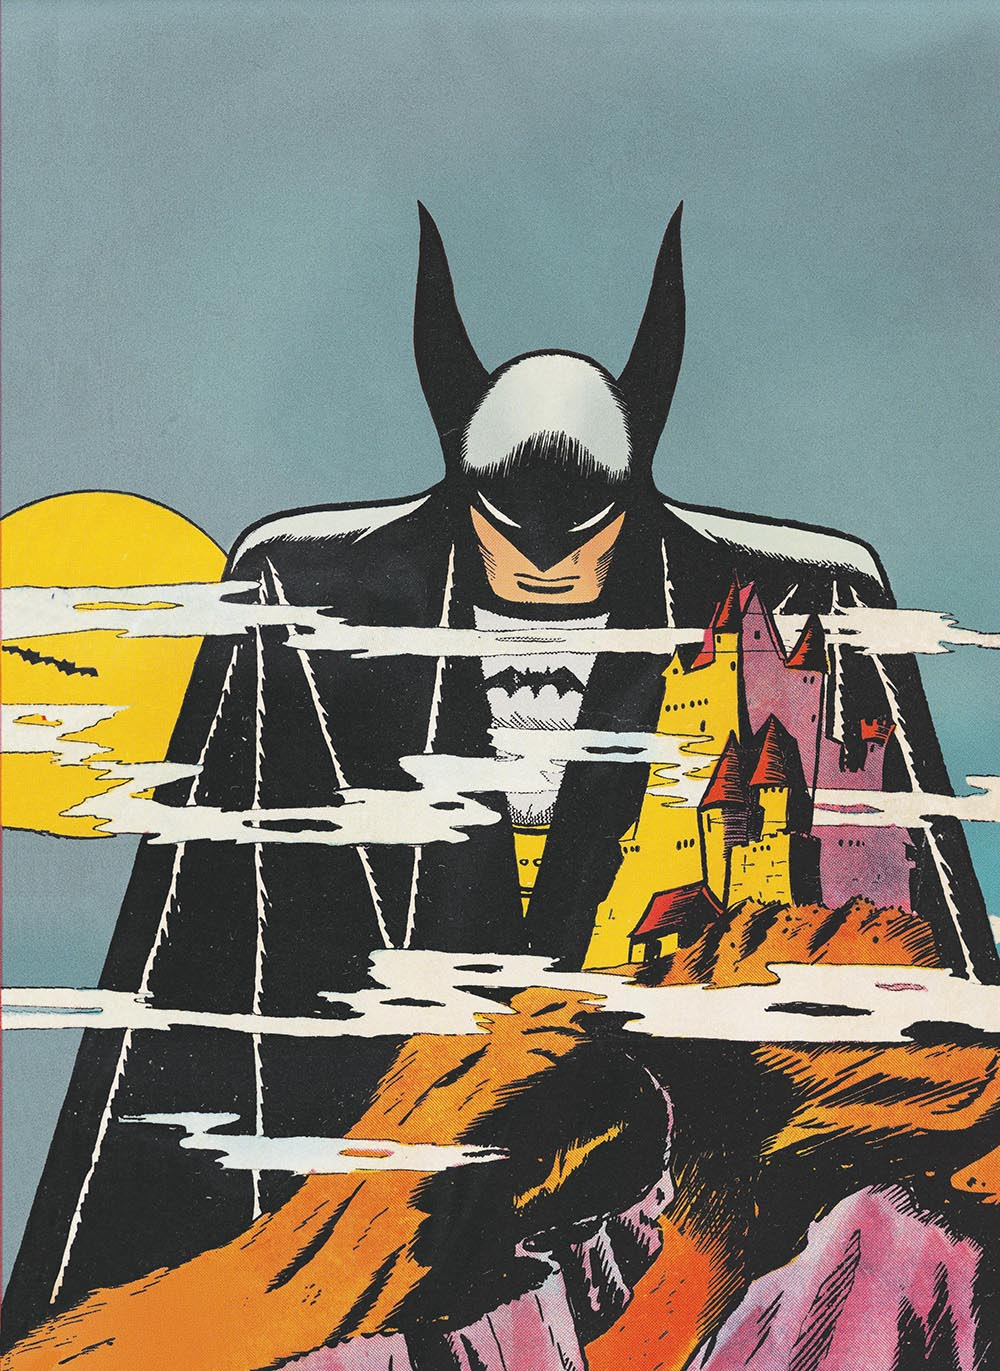 Detective Comics No. 31 cover art by Bob Kane, September 1939